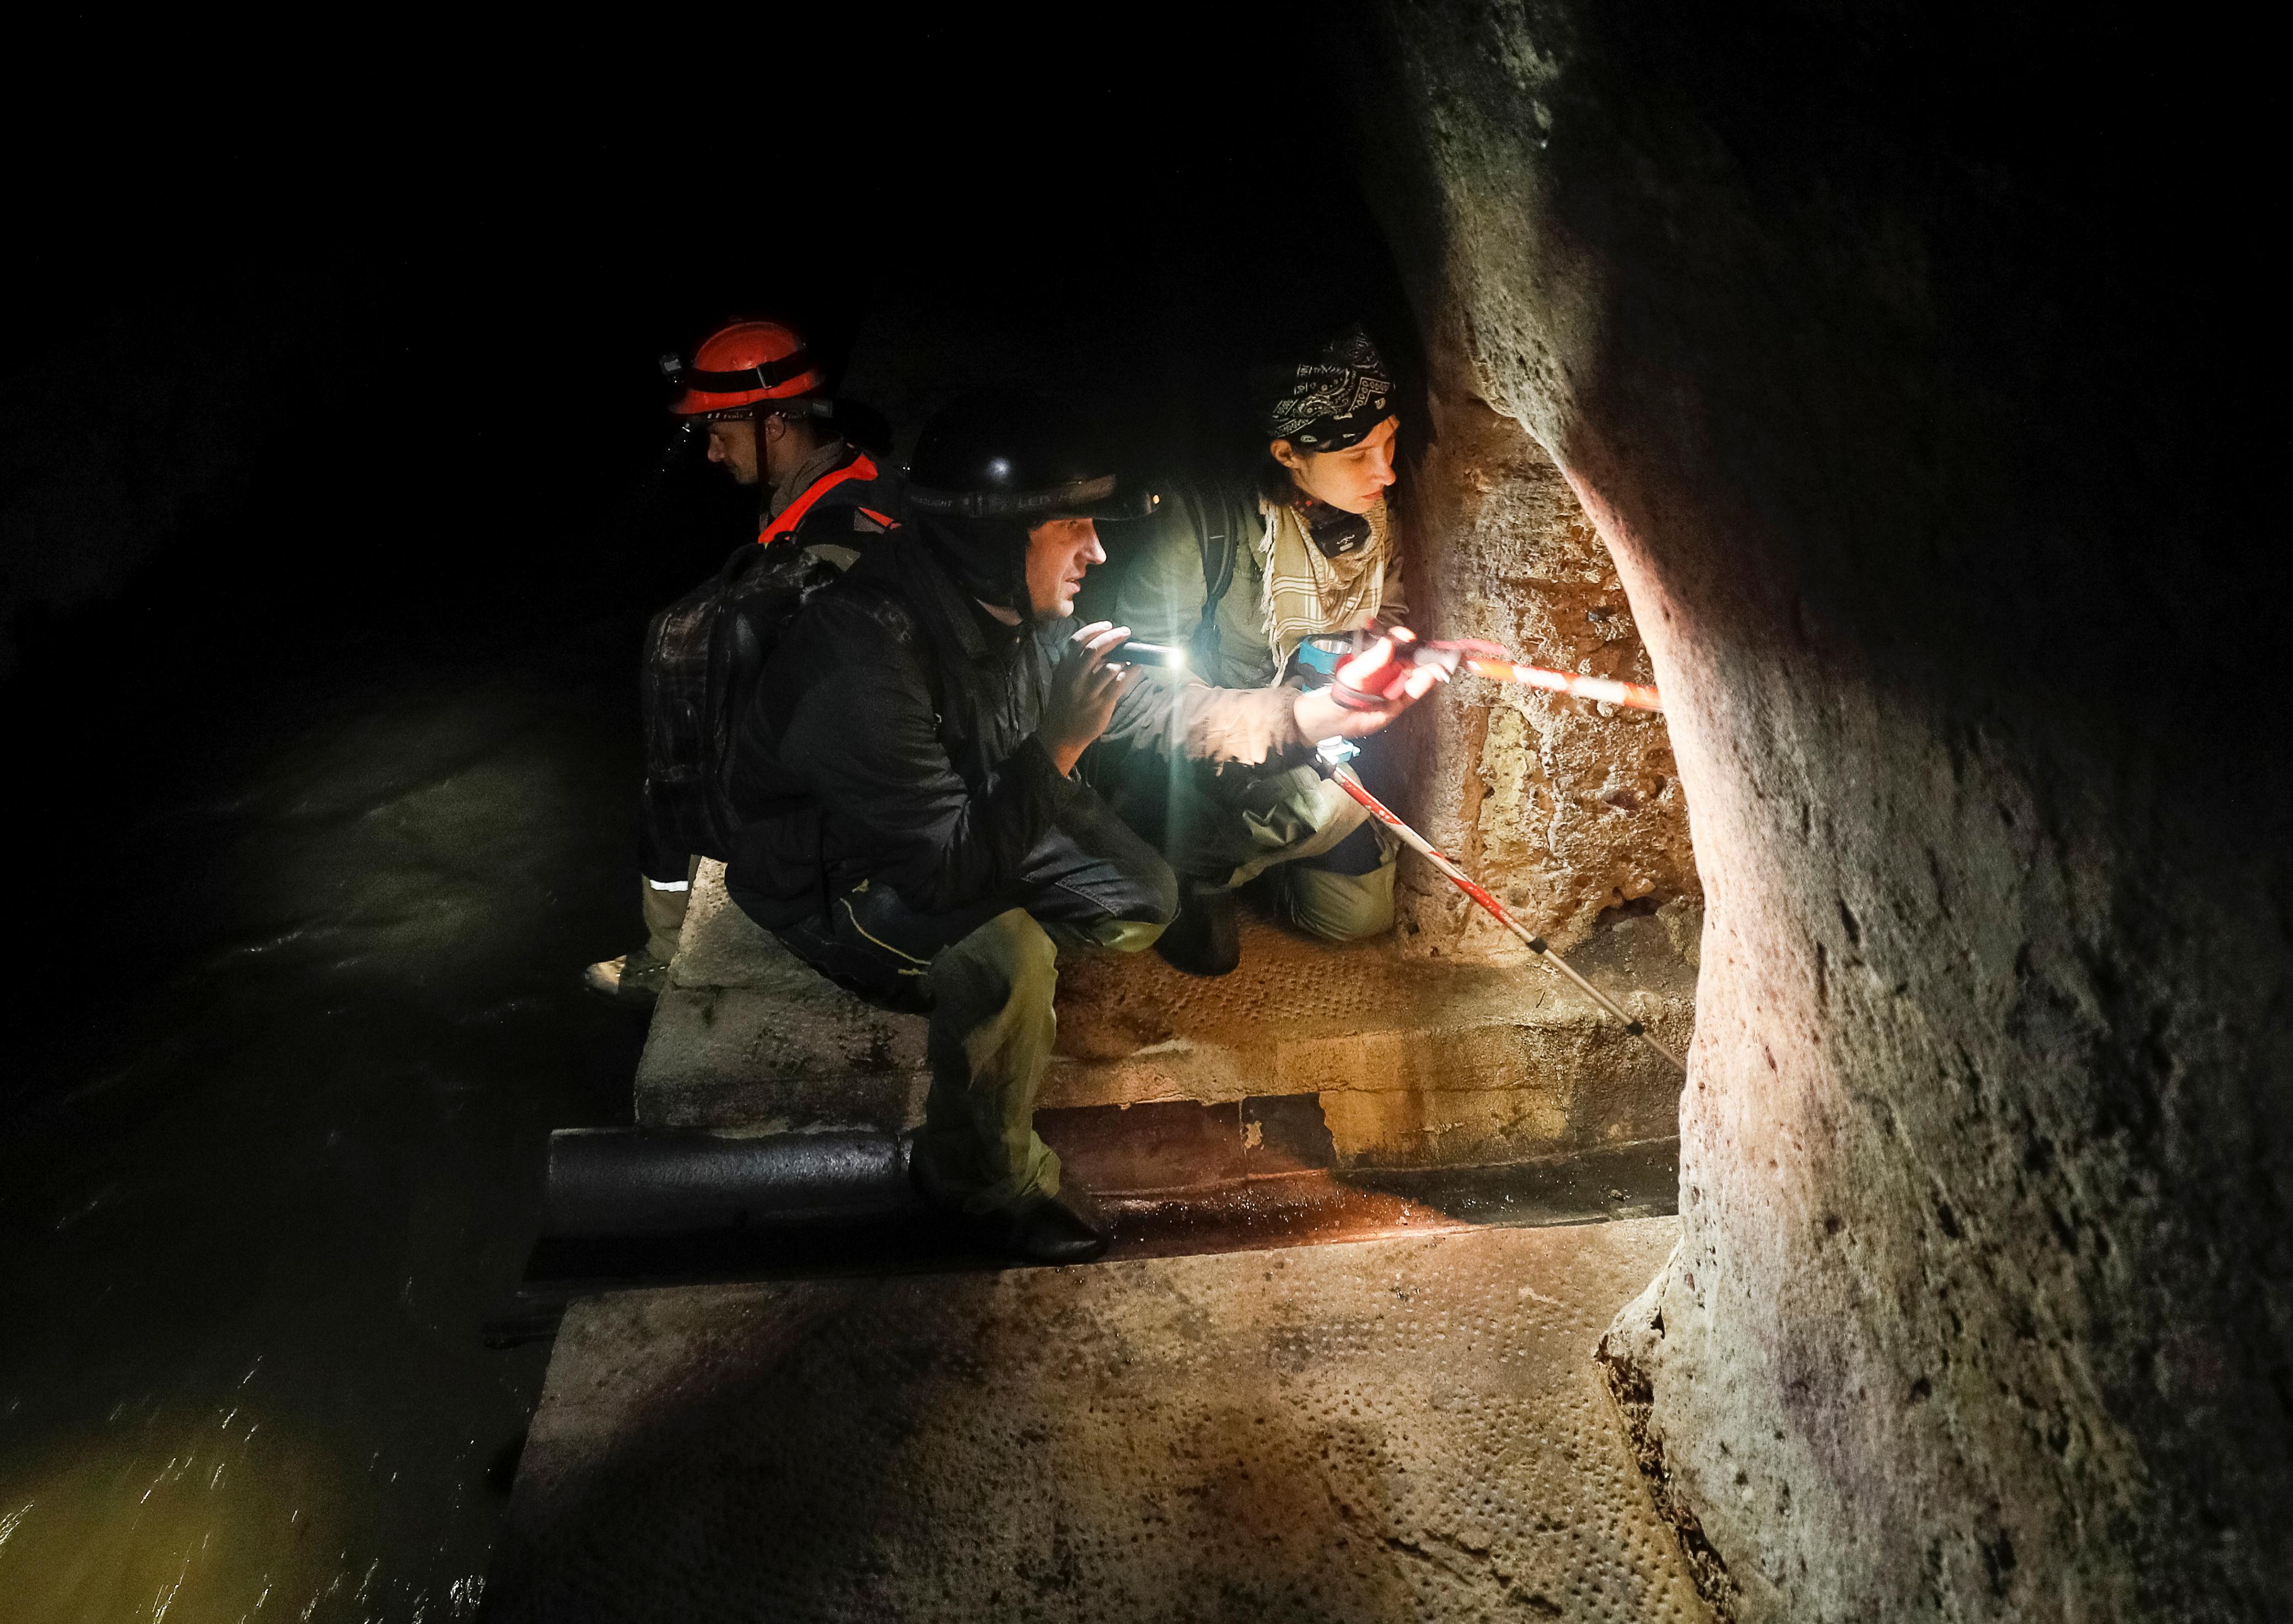 Diggers Andriy Ryshtun and Oleksandr Ivanov and historian Hanna Tychka explore the city sewage system where dozens of Jews were hiding from the Nazis during World War Two in Lviv, Ukraine September 25, 2021. REUTERS/Gleb Garanich